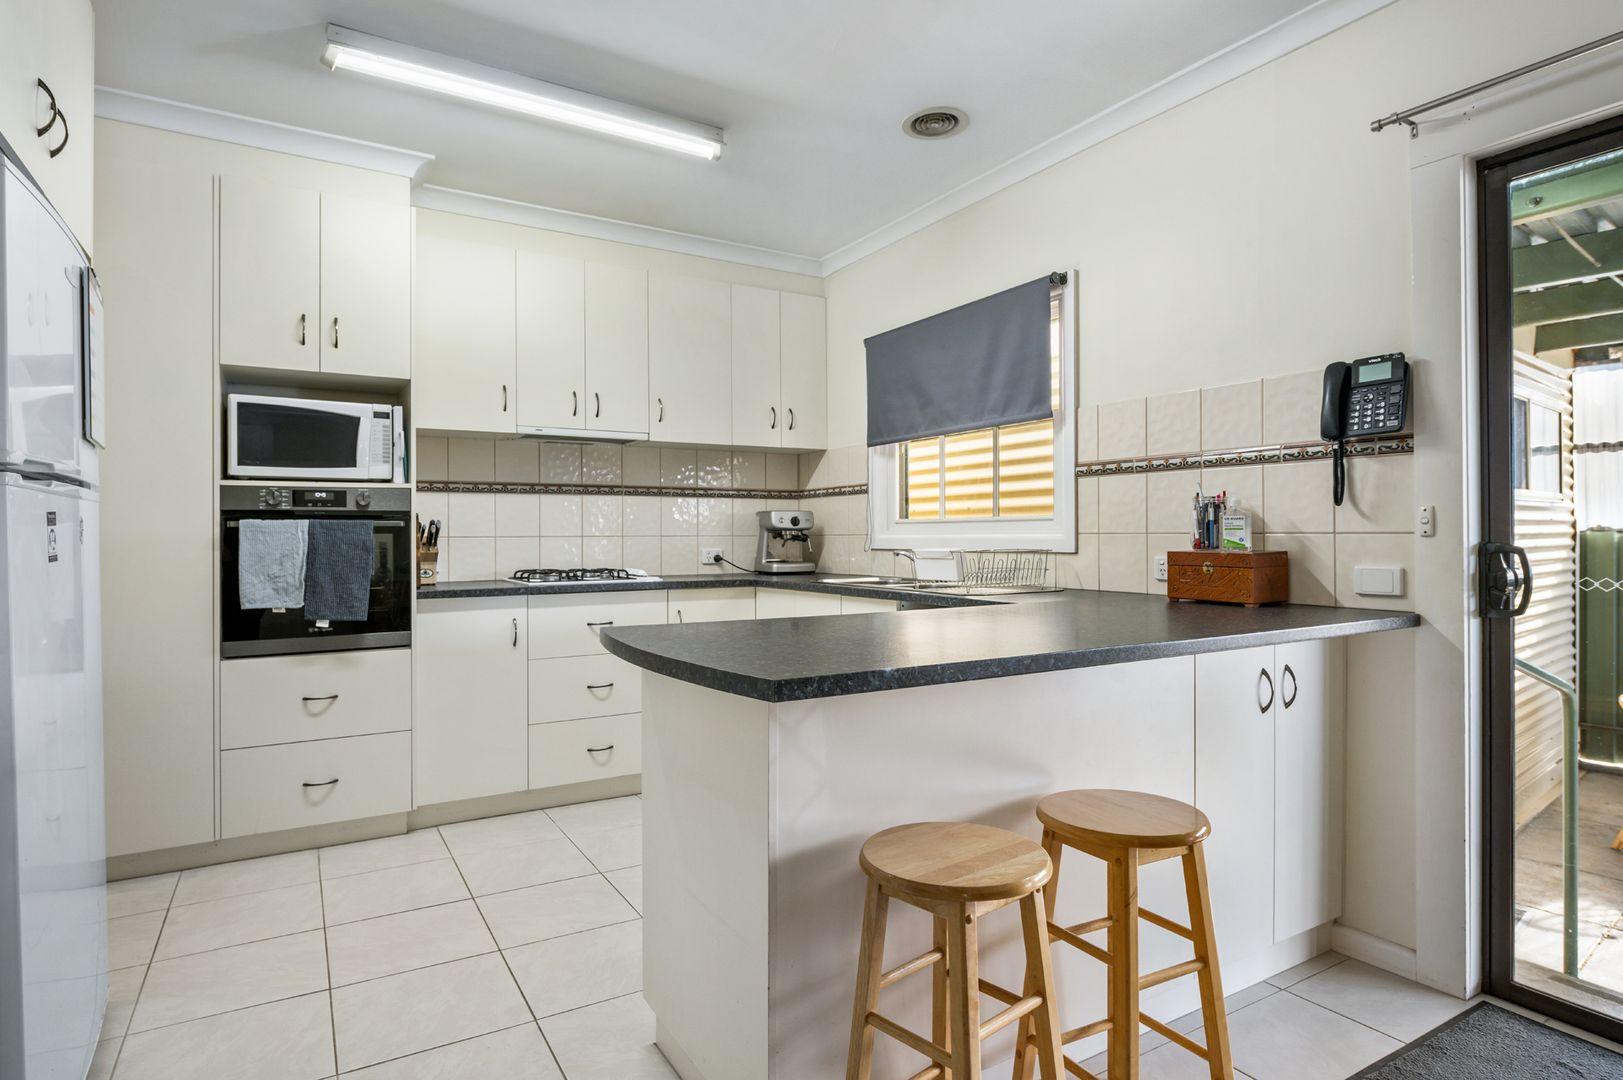 12 O'Keeffe Street, Wangaratta VIC 3677, Image 1